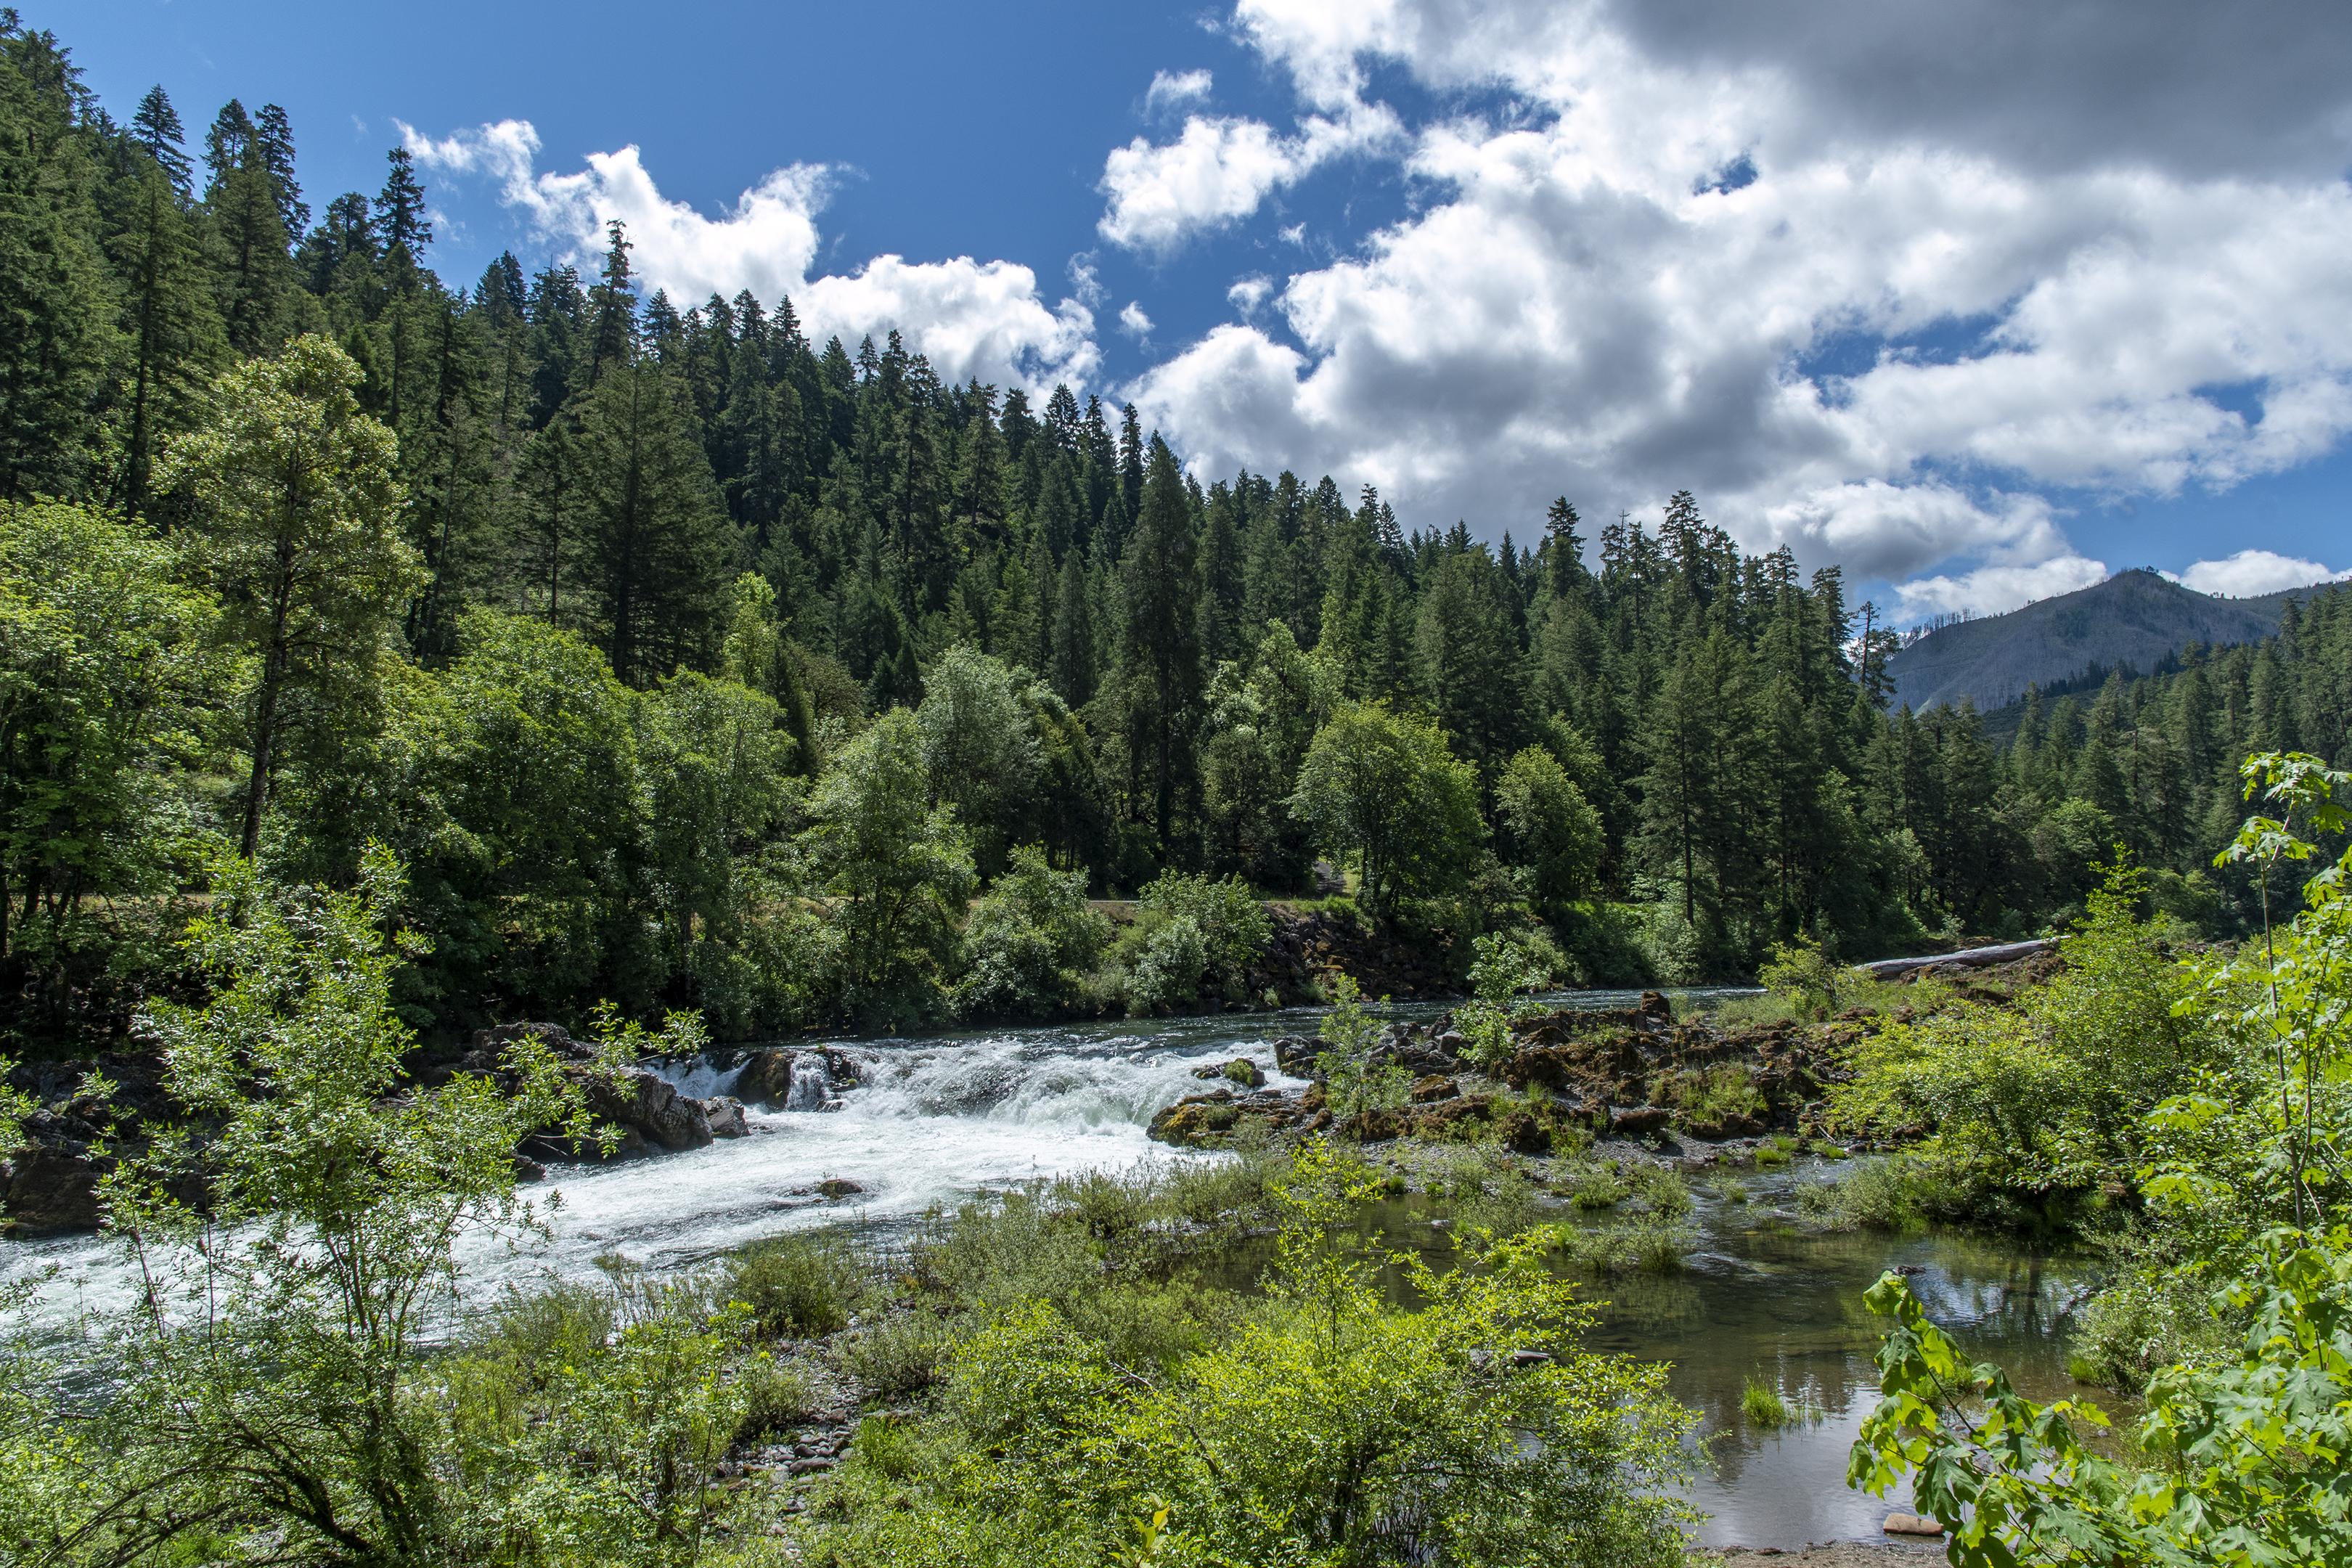 Swiftwater Trail north umpqua river deadline falls